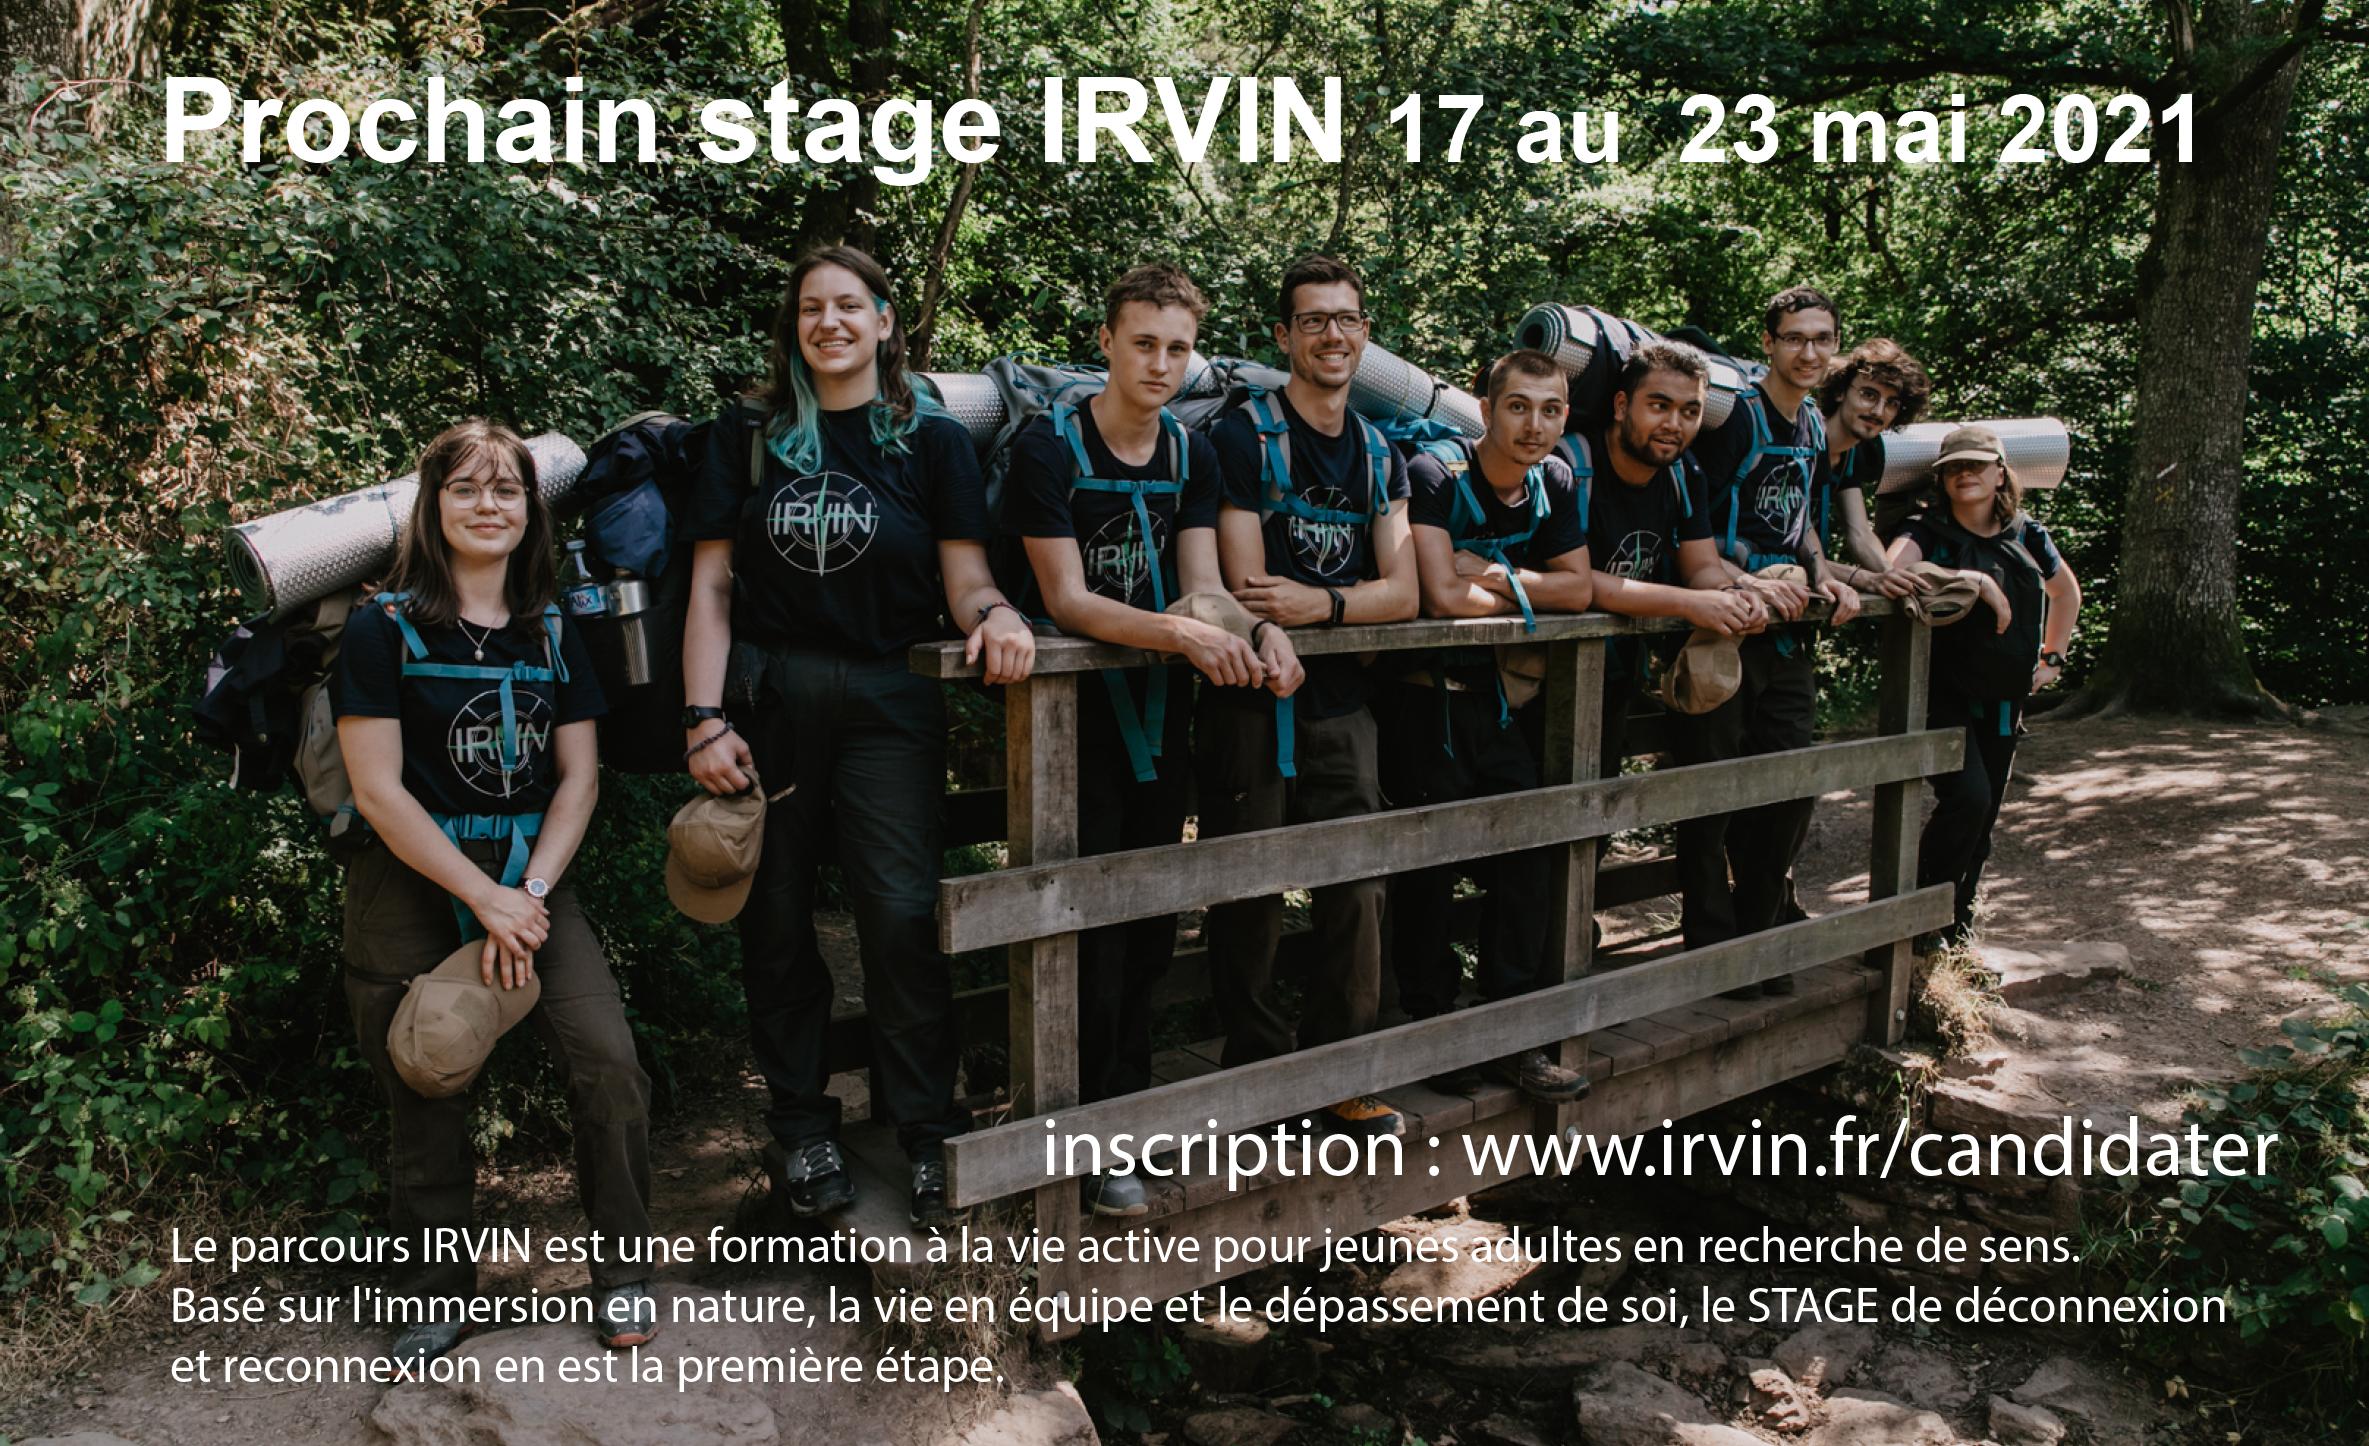 stage IRVIN du 17 au 23 mai 2021